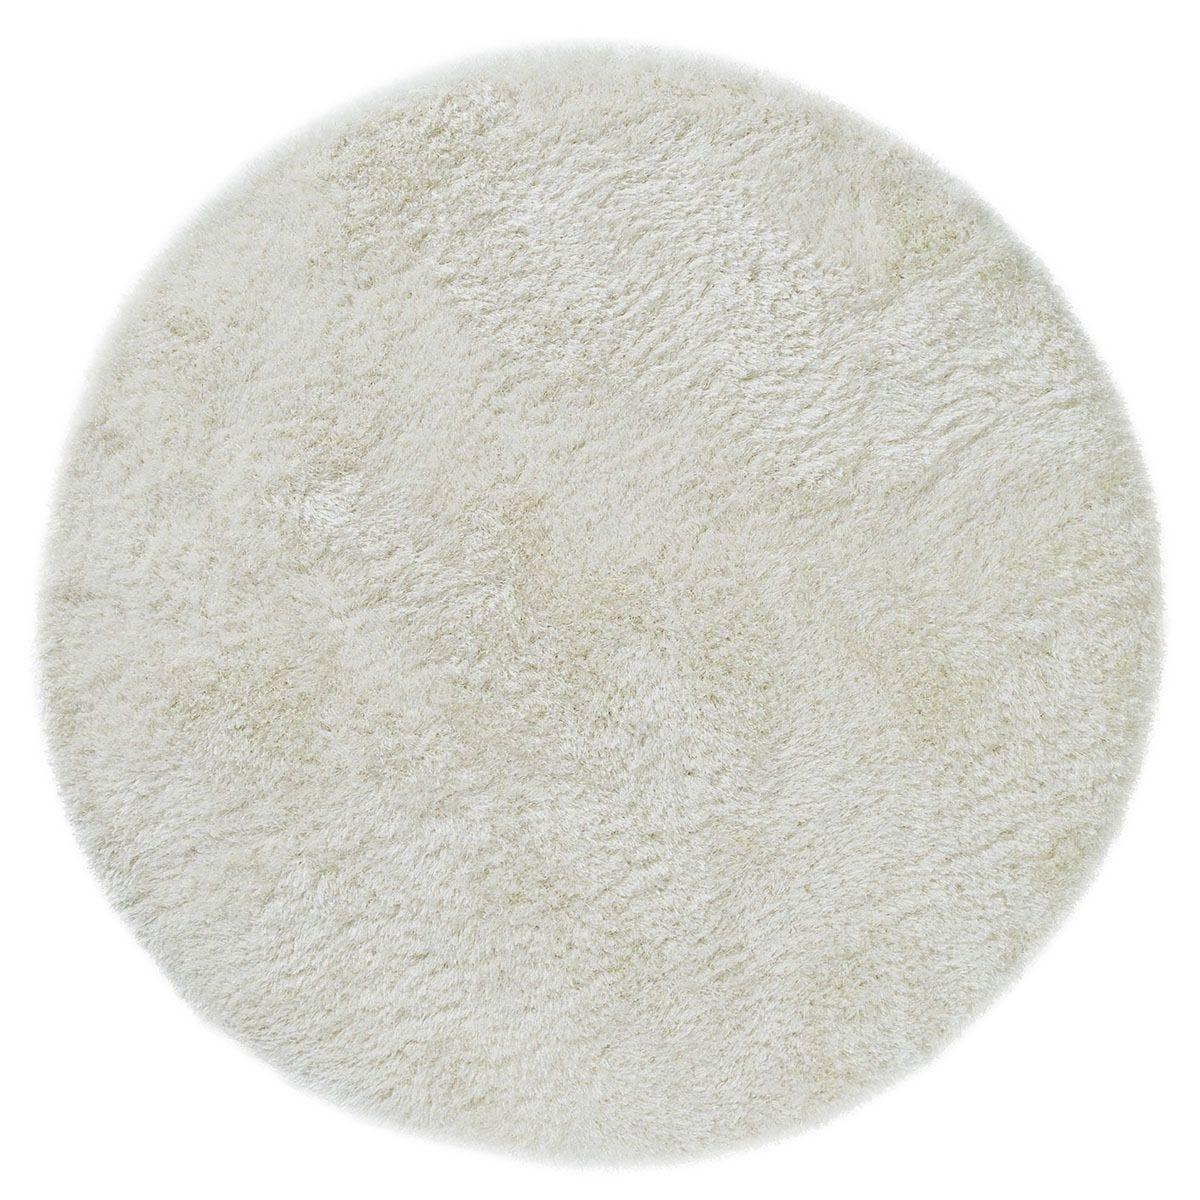 Asiatic Circle Shaggy Rug - White